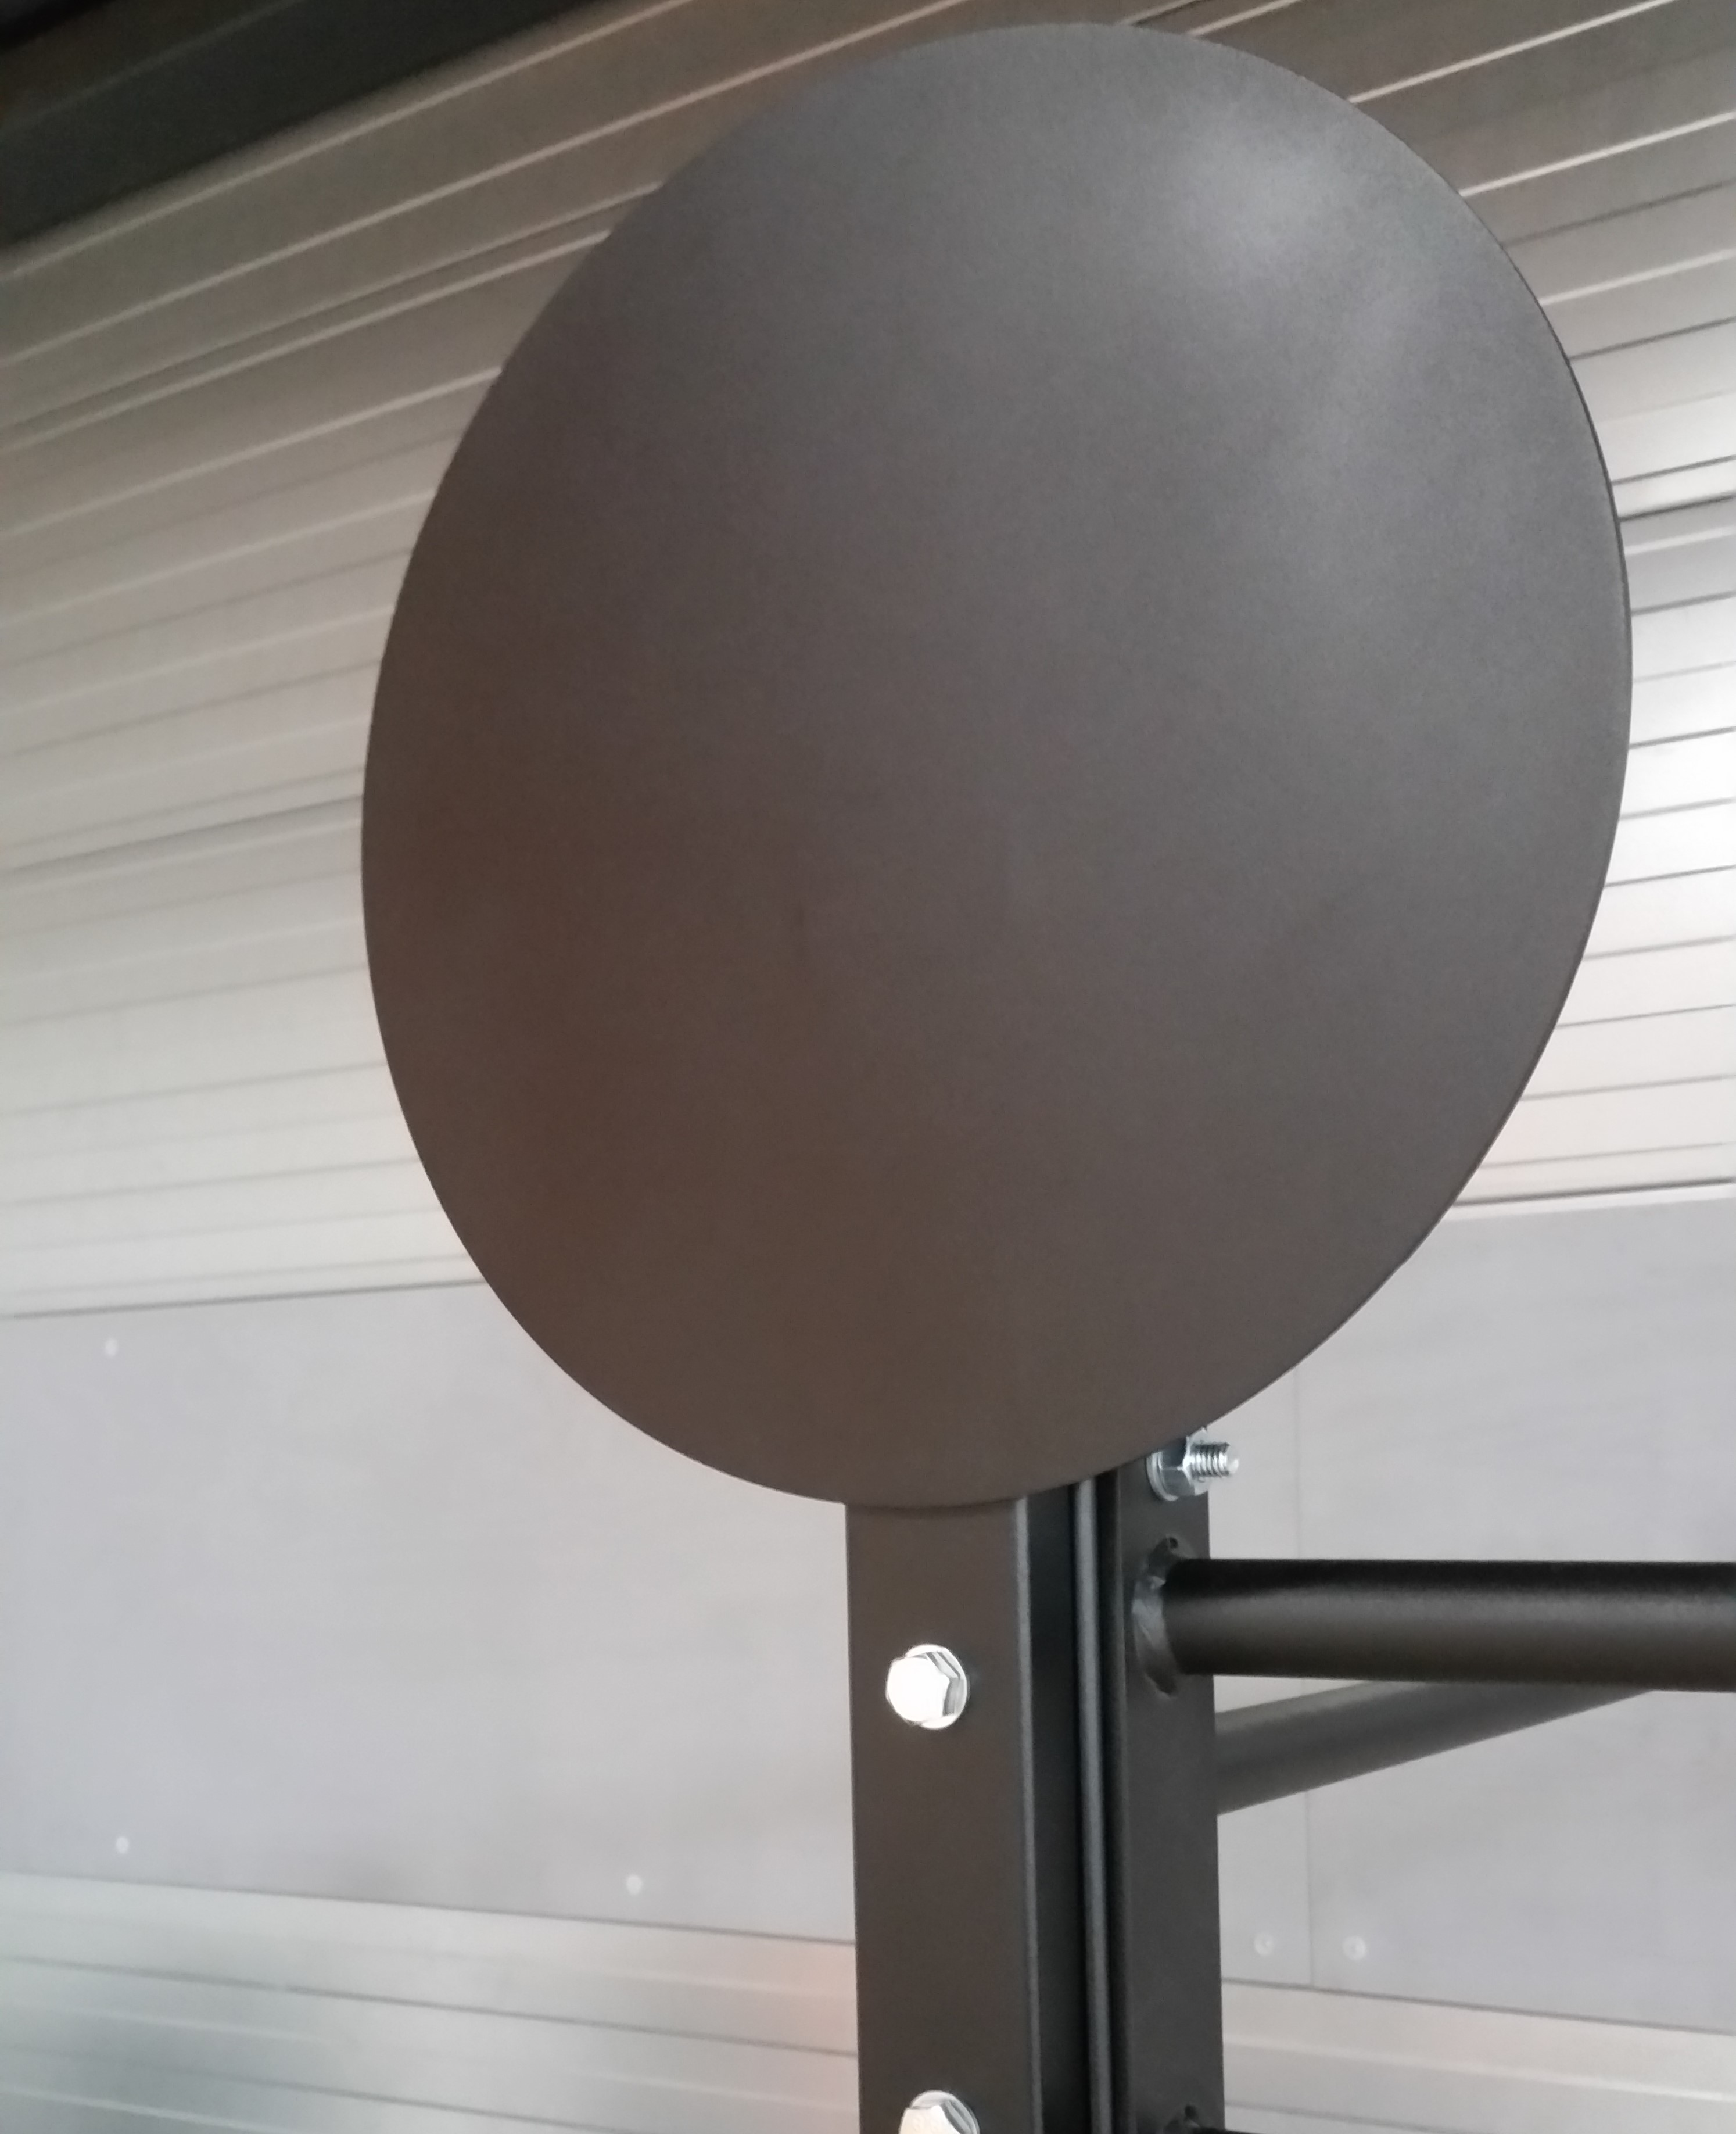 Wall ball target